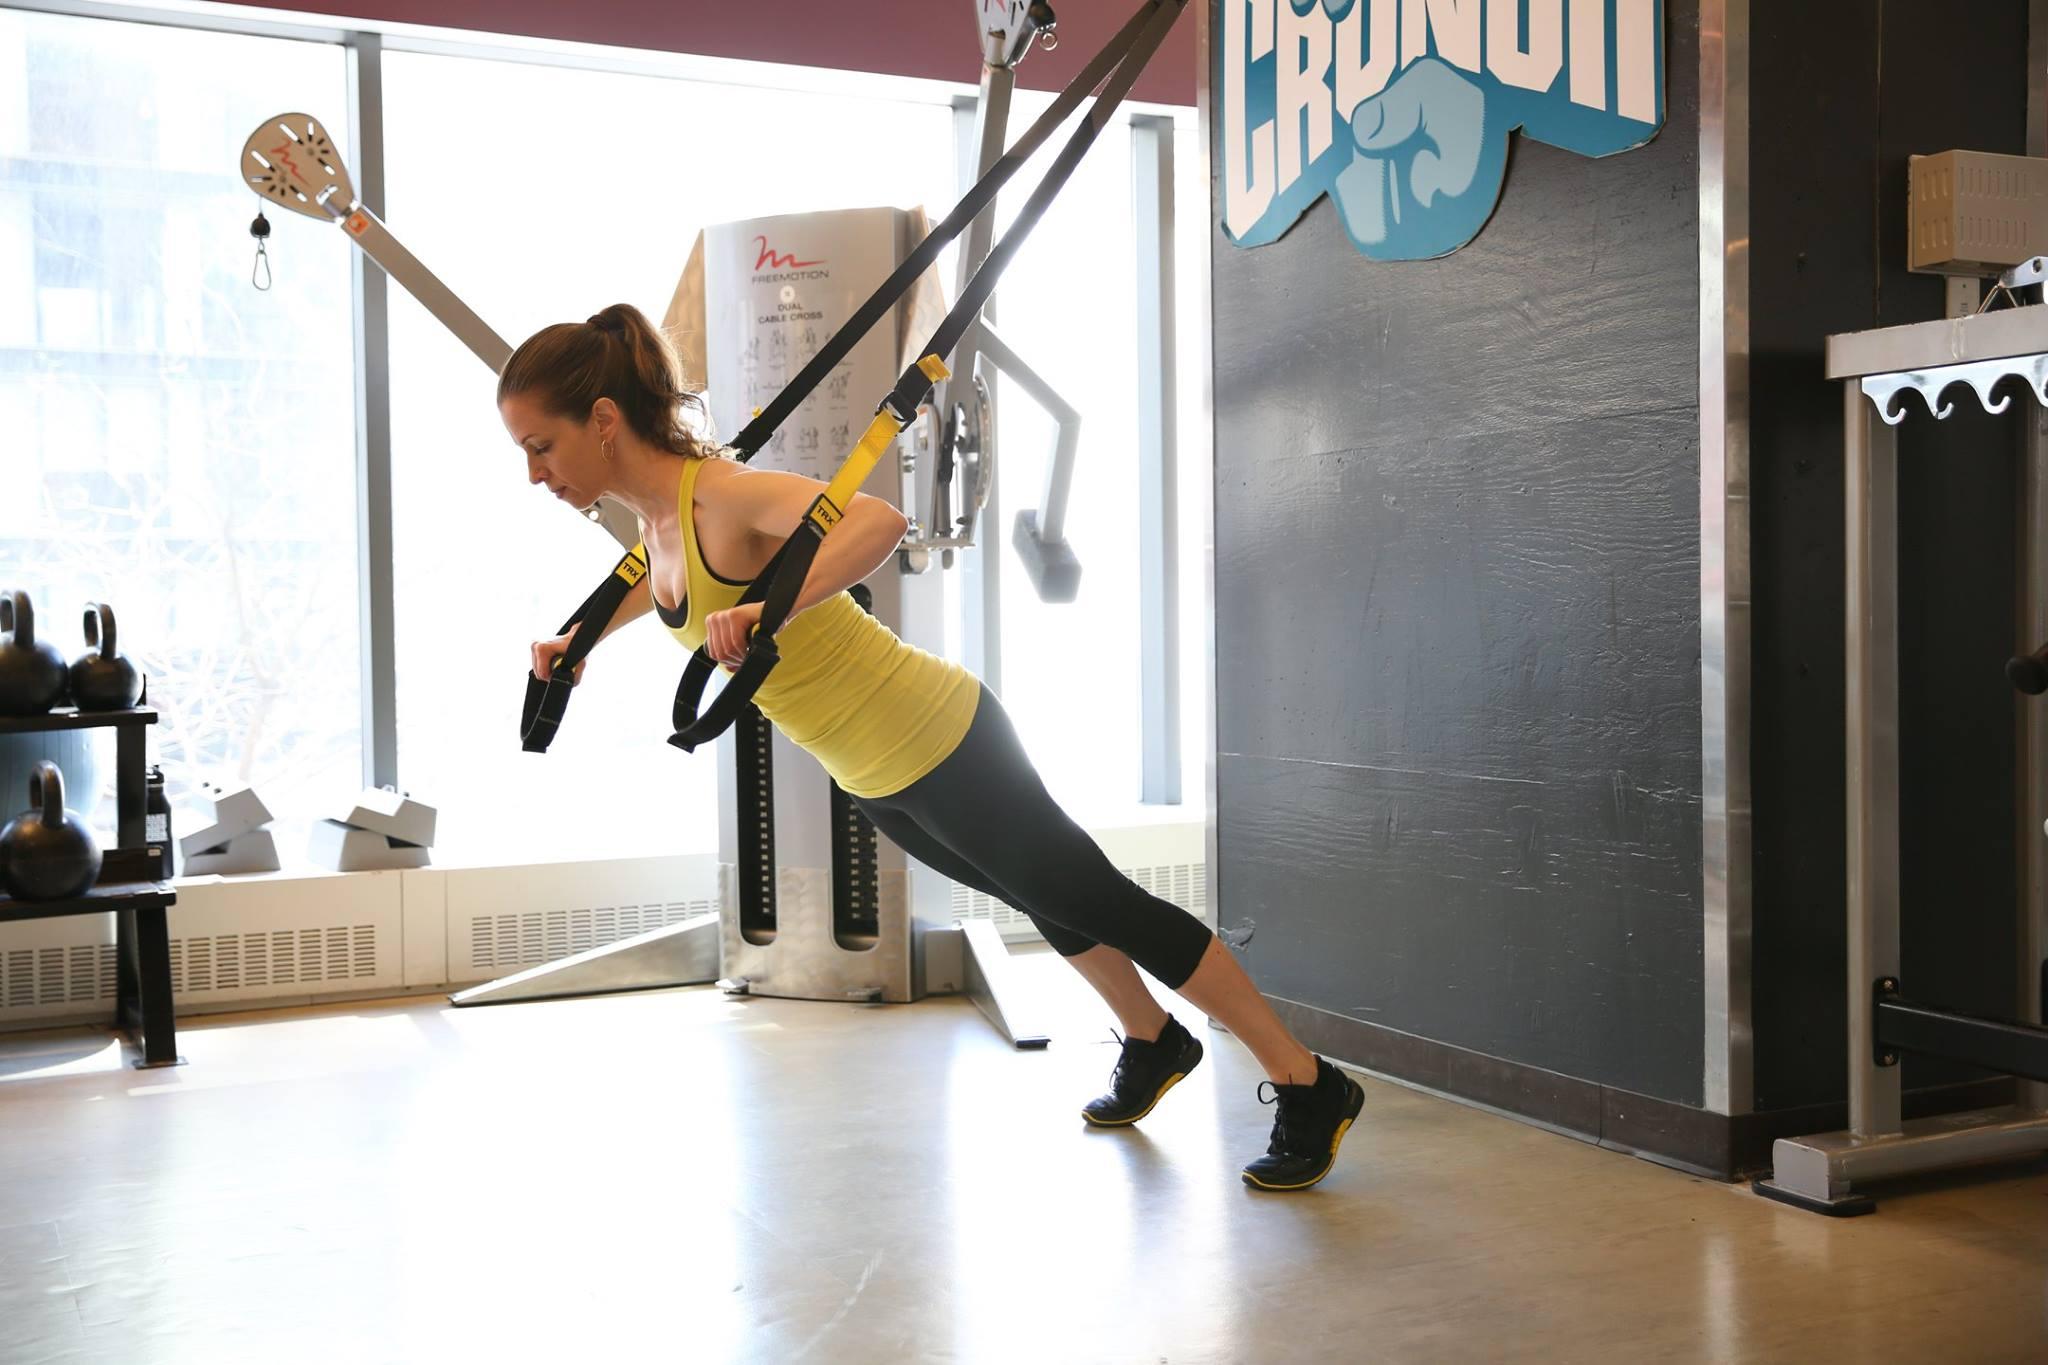 Crunch Gym - New York Informative